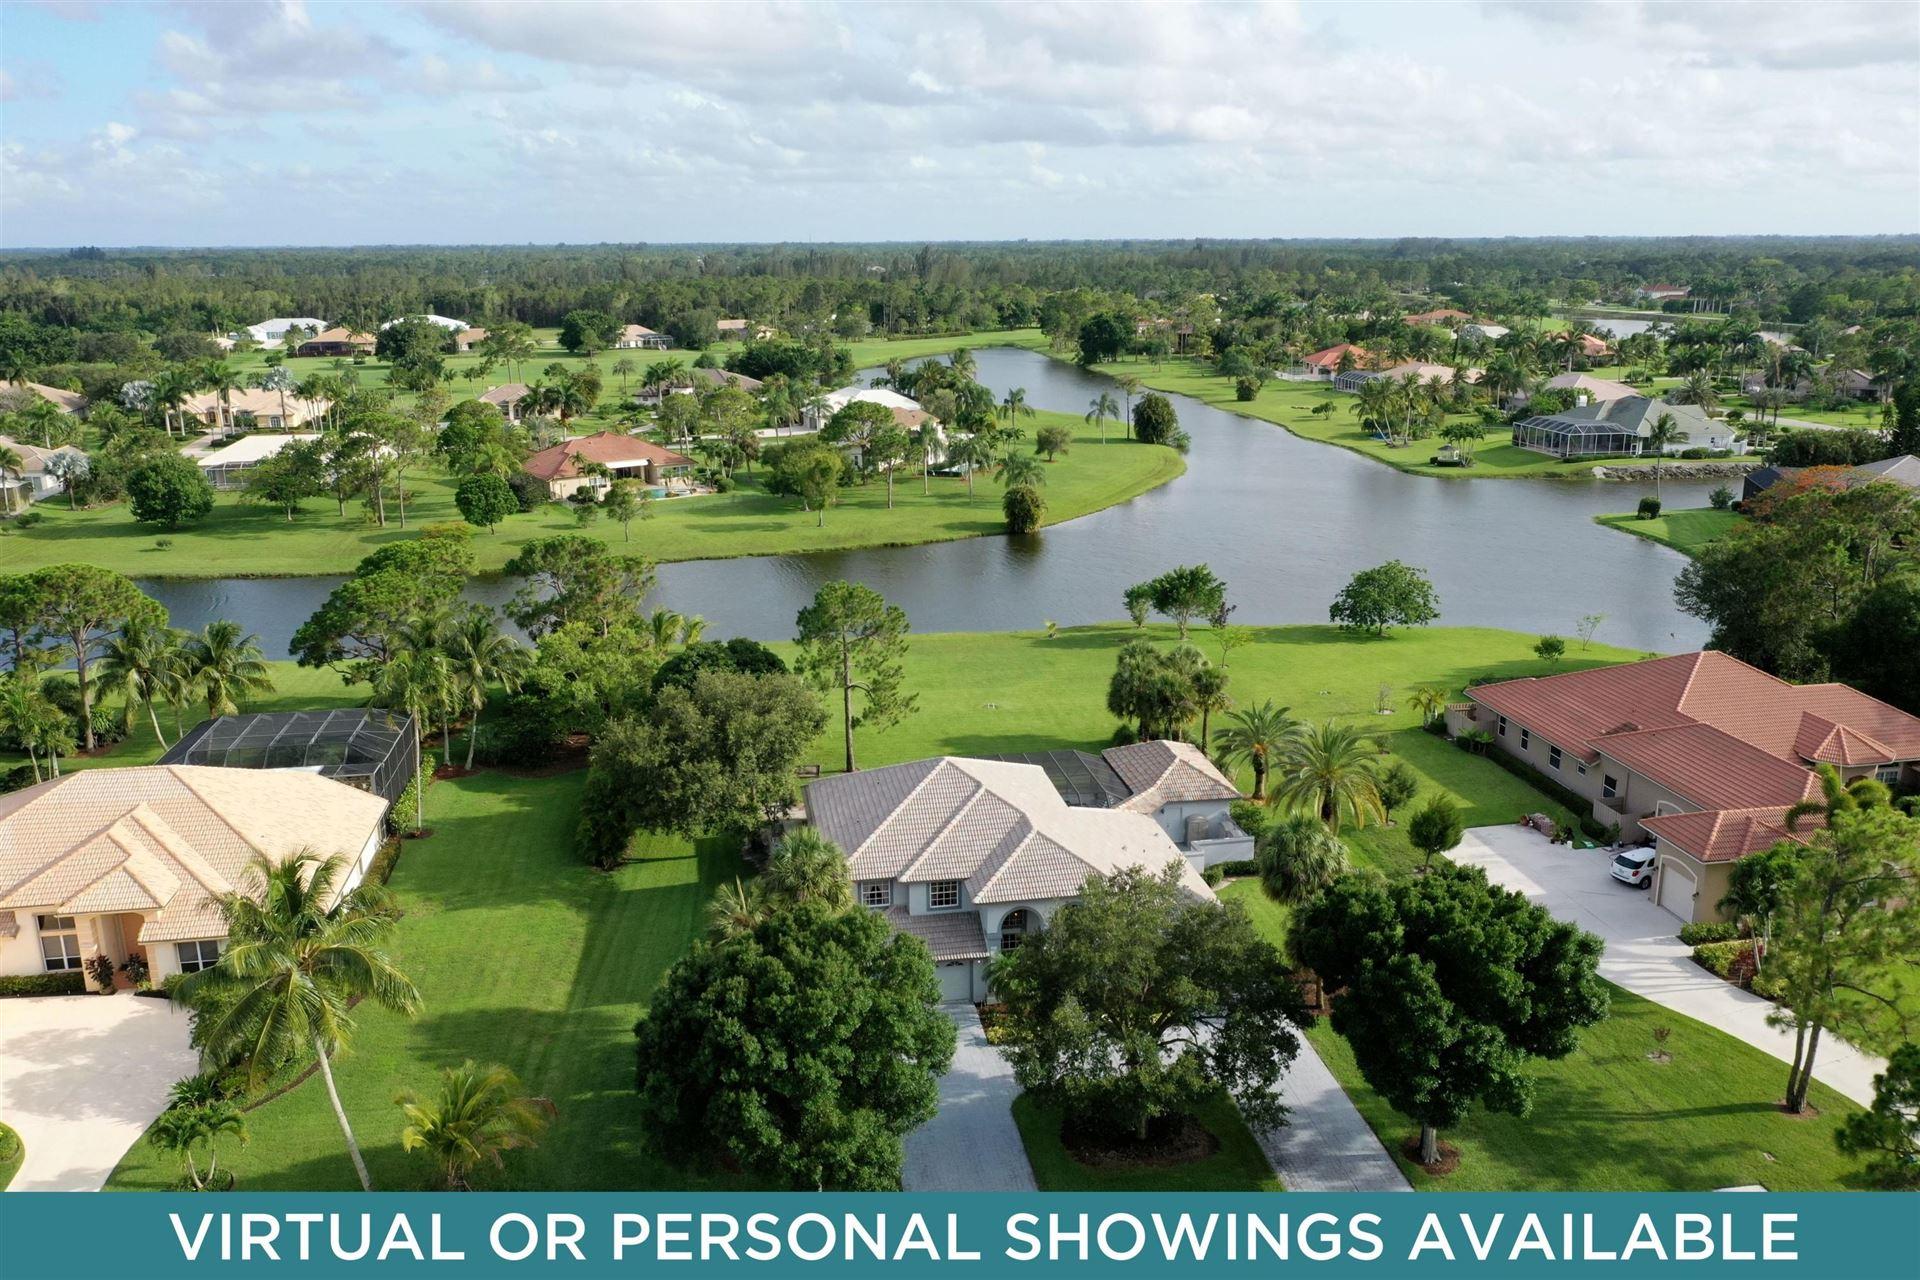 11760 Blackwoods Lane, Palm Beach Gardens, FL 33412 - MLS#: RX-10621812